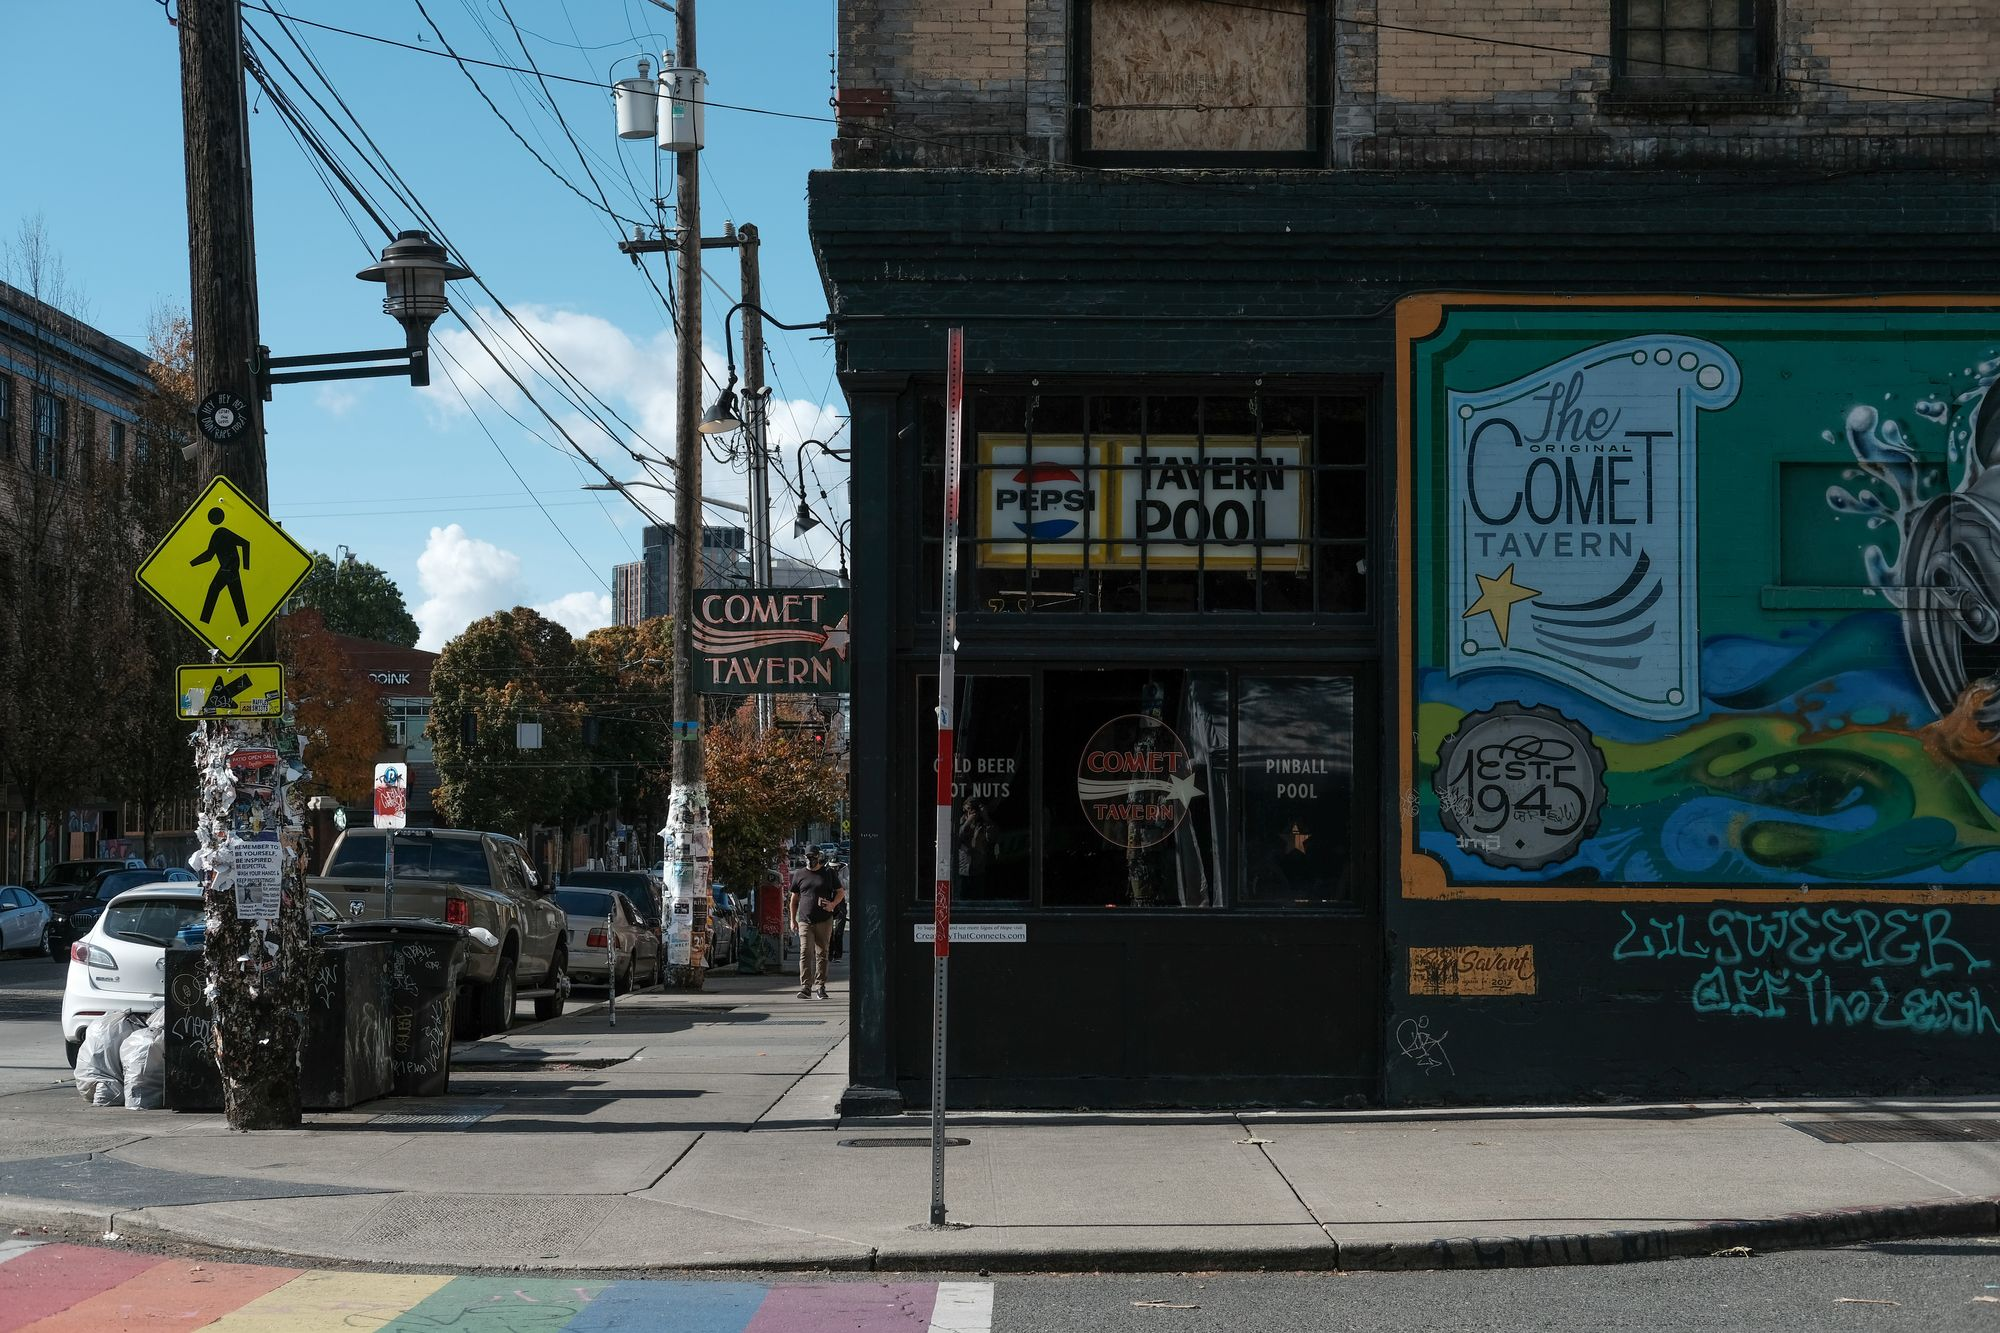 Comet Tavern, Capitol Hill, Seattle, 2020.